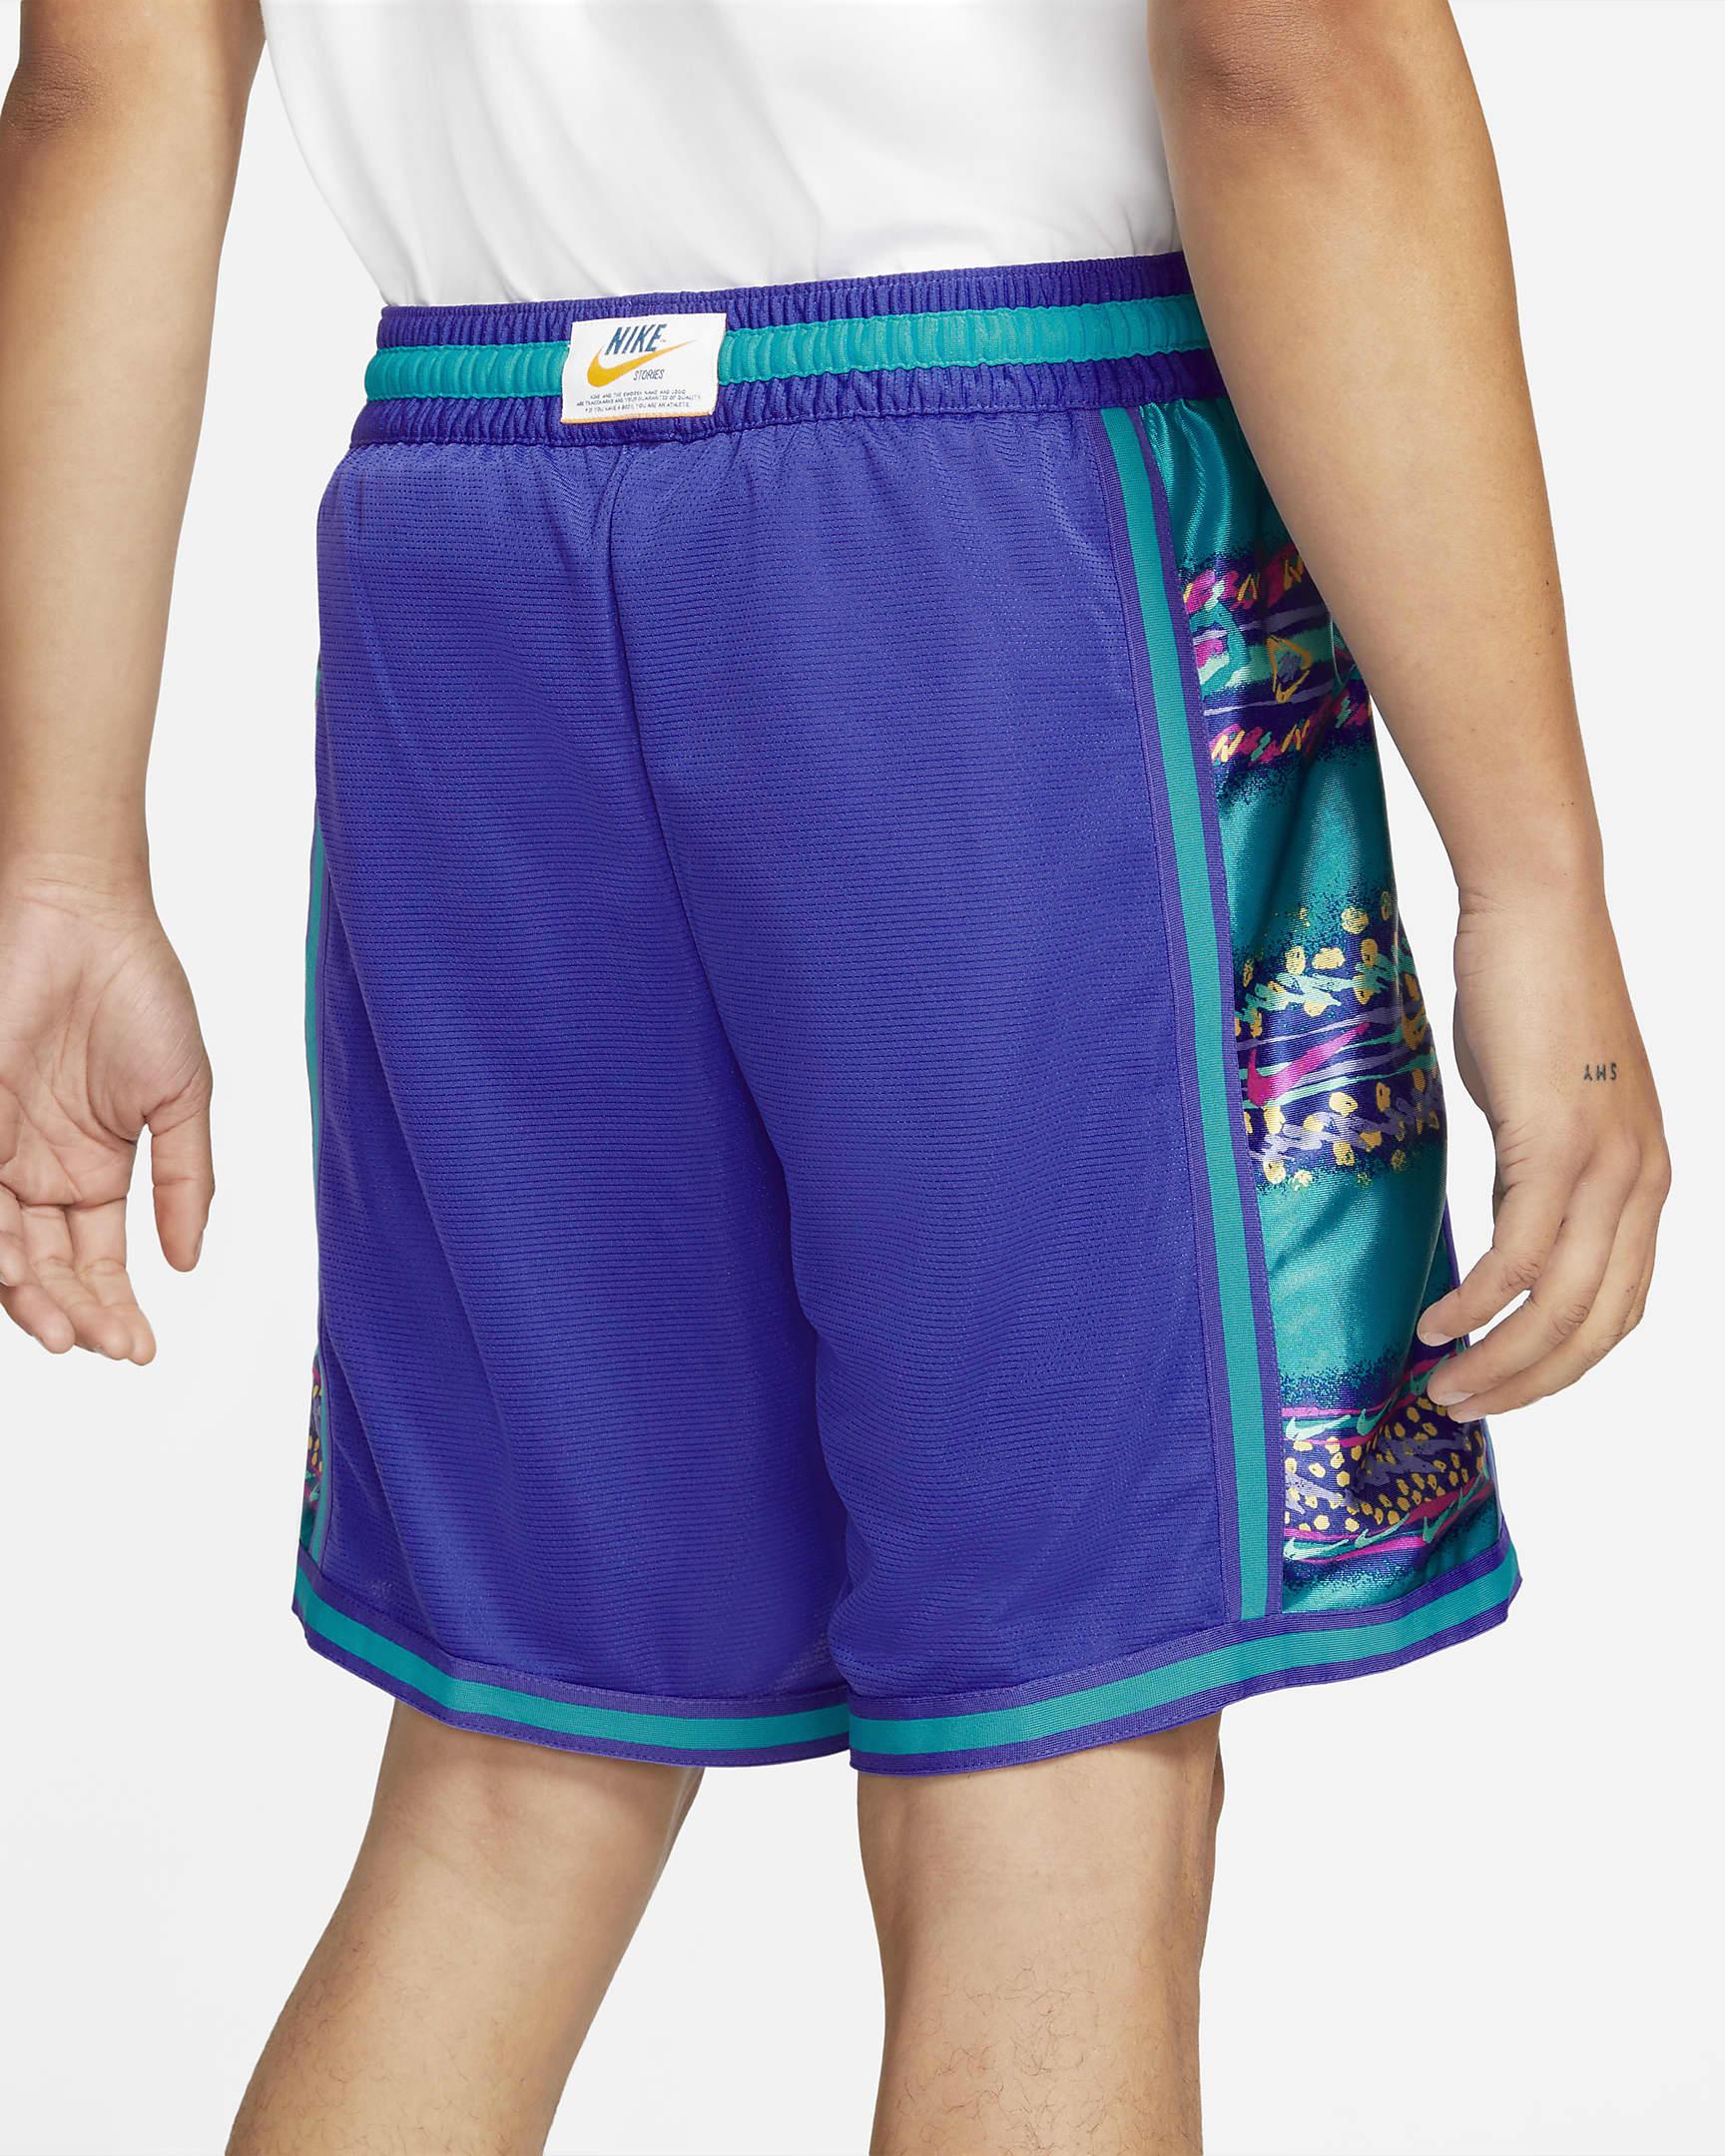 nike-dri-fit-dna-stories-mens-basketball-shorts-gLqWHW-1.png